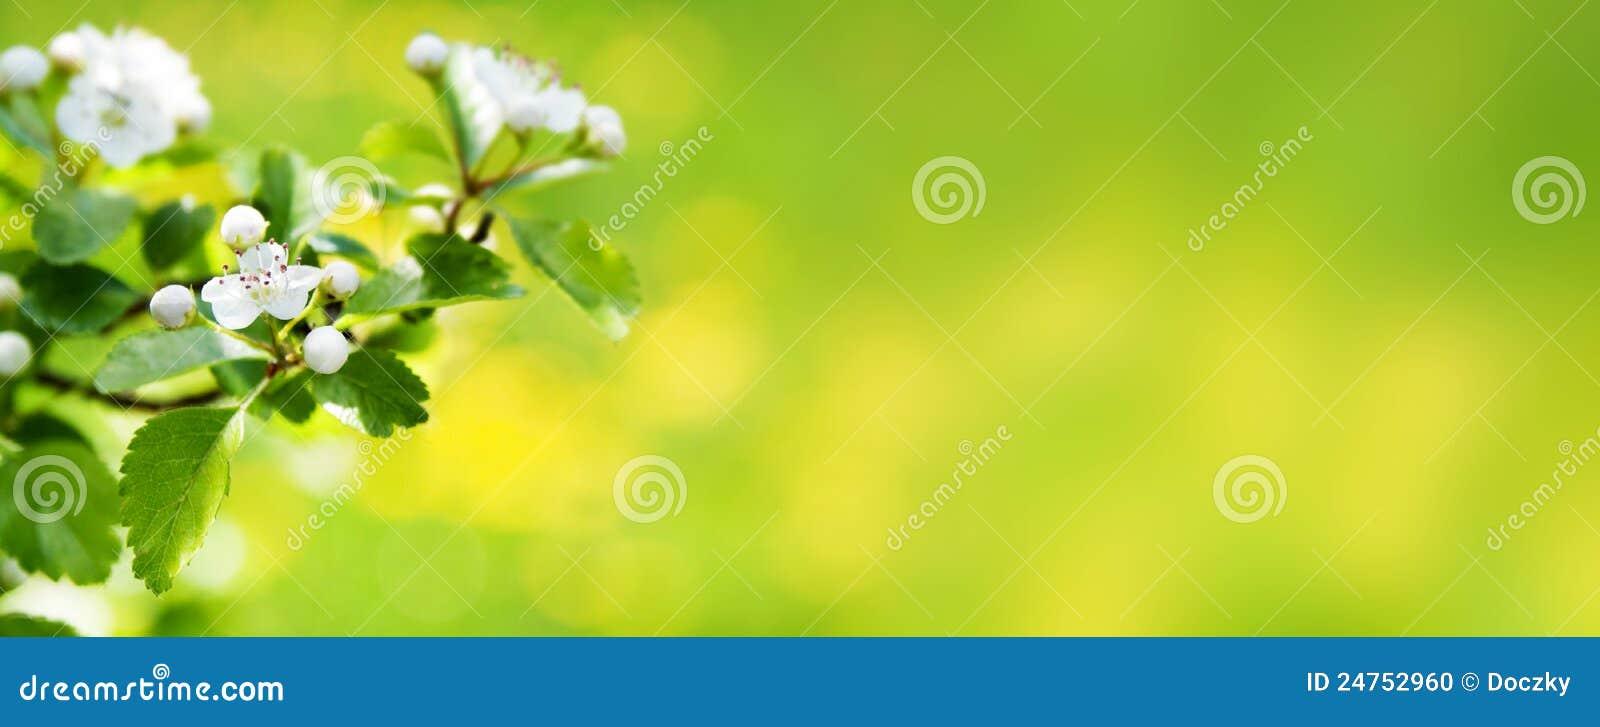 Frühlingsnaturblütenweb-Fahne oder -vorsatz.